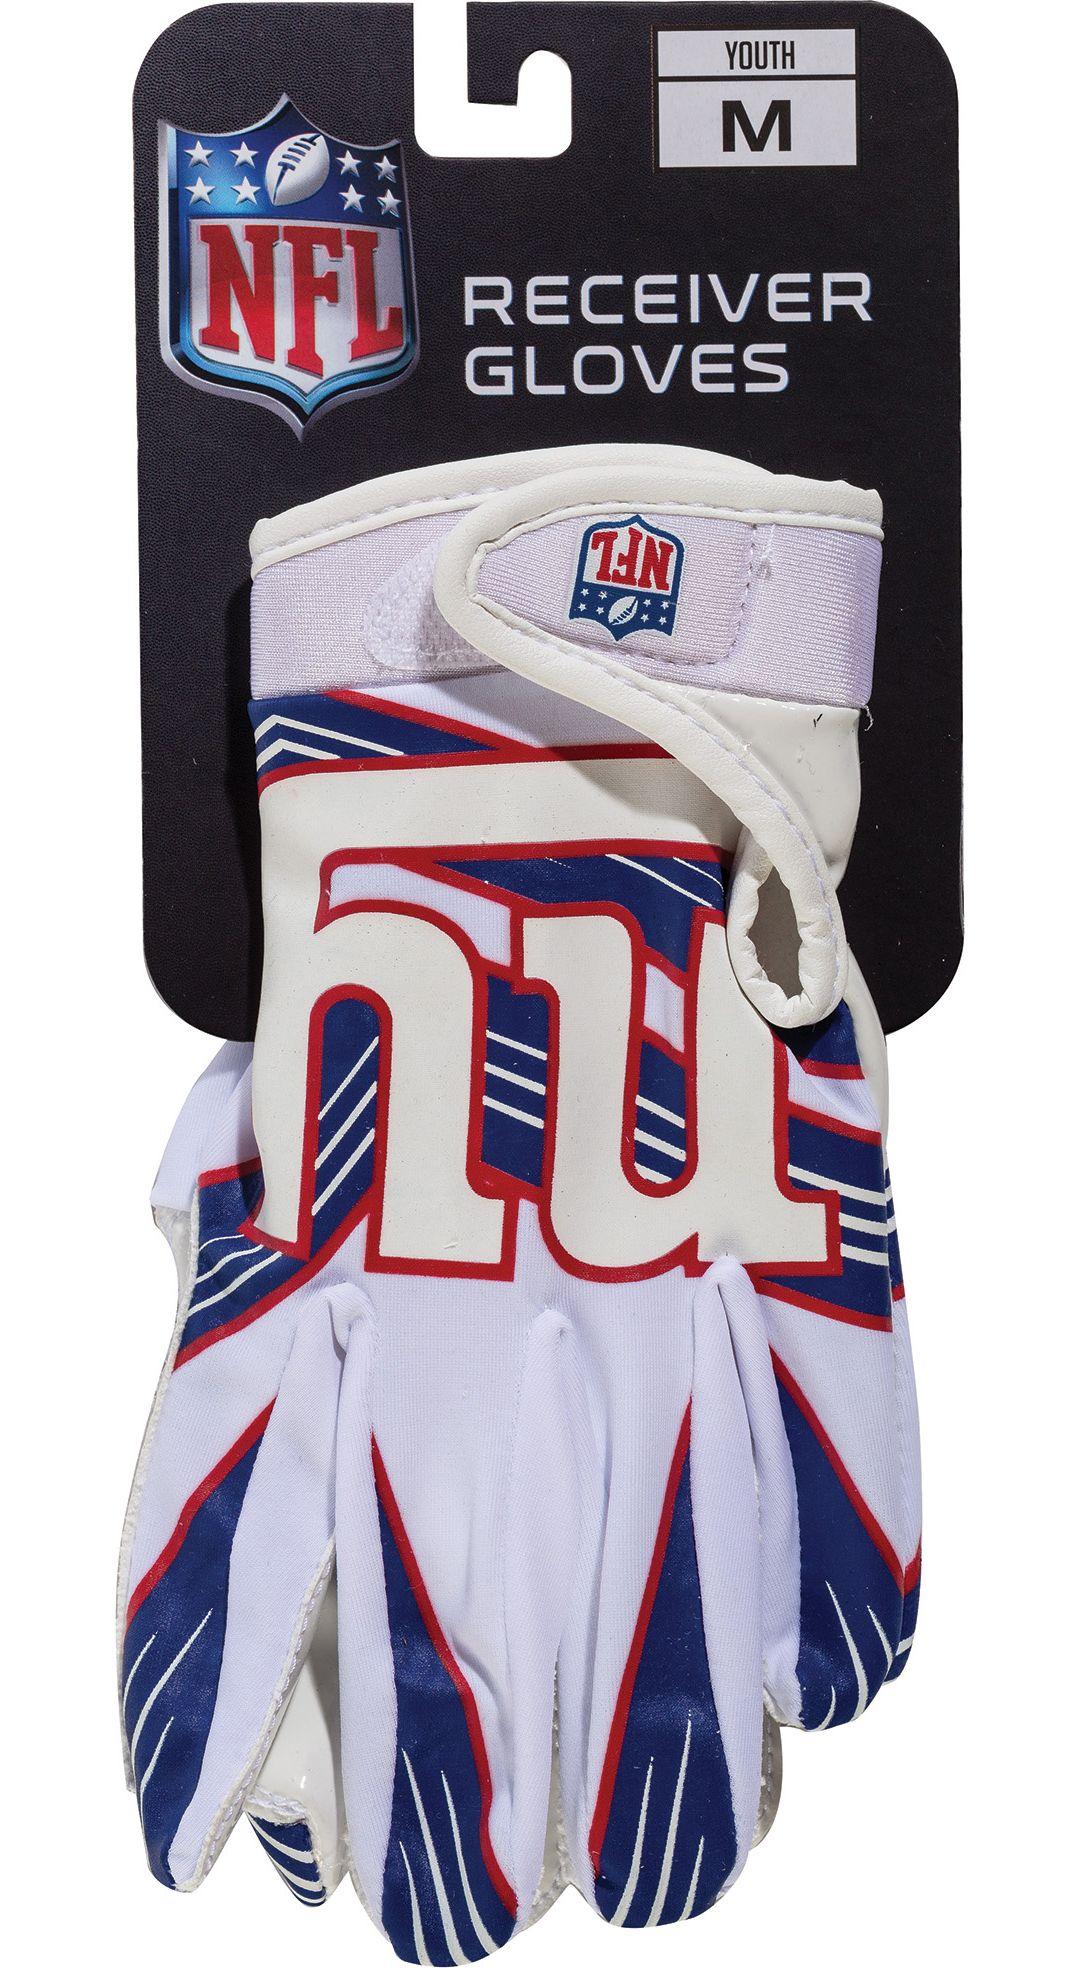 sale retailer 96bb9 f738c Franklin New York Giants Receiver Gloves